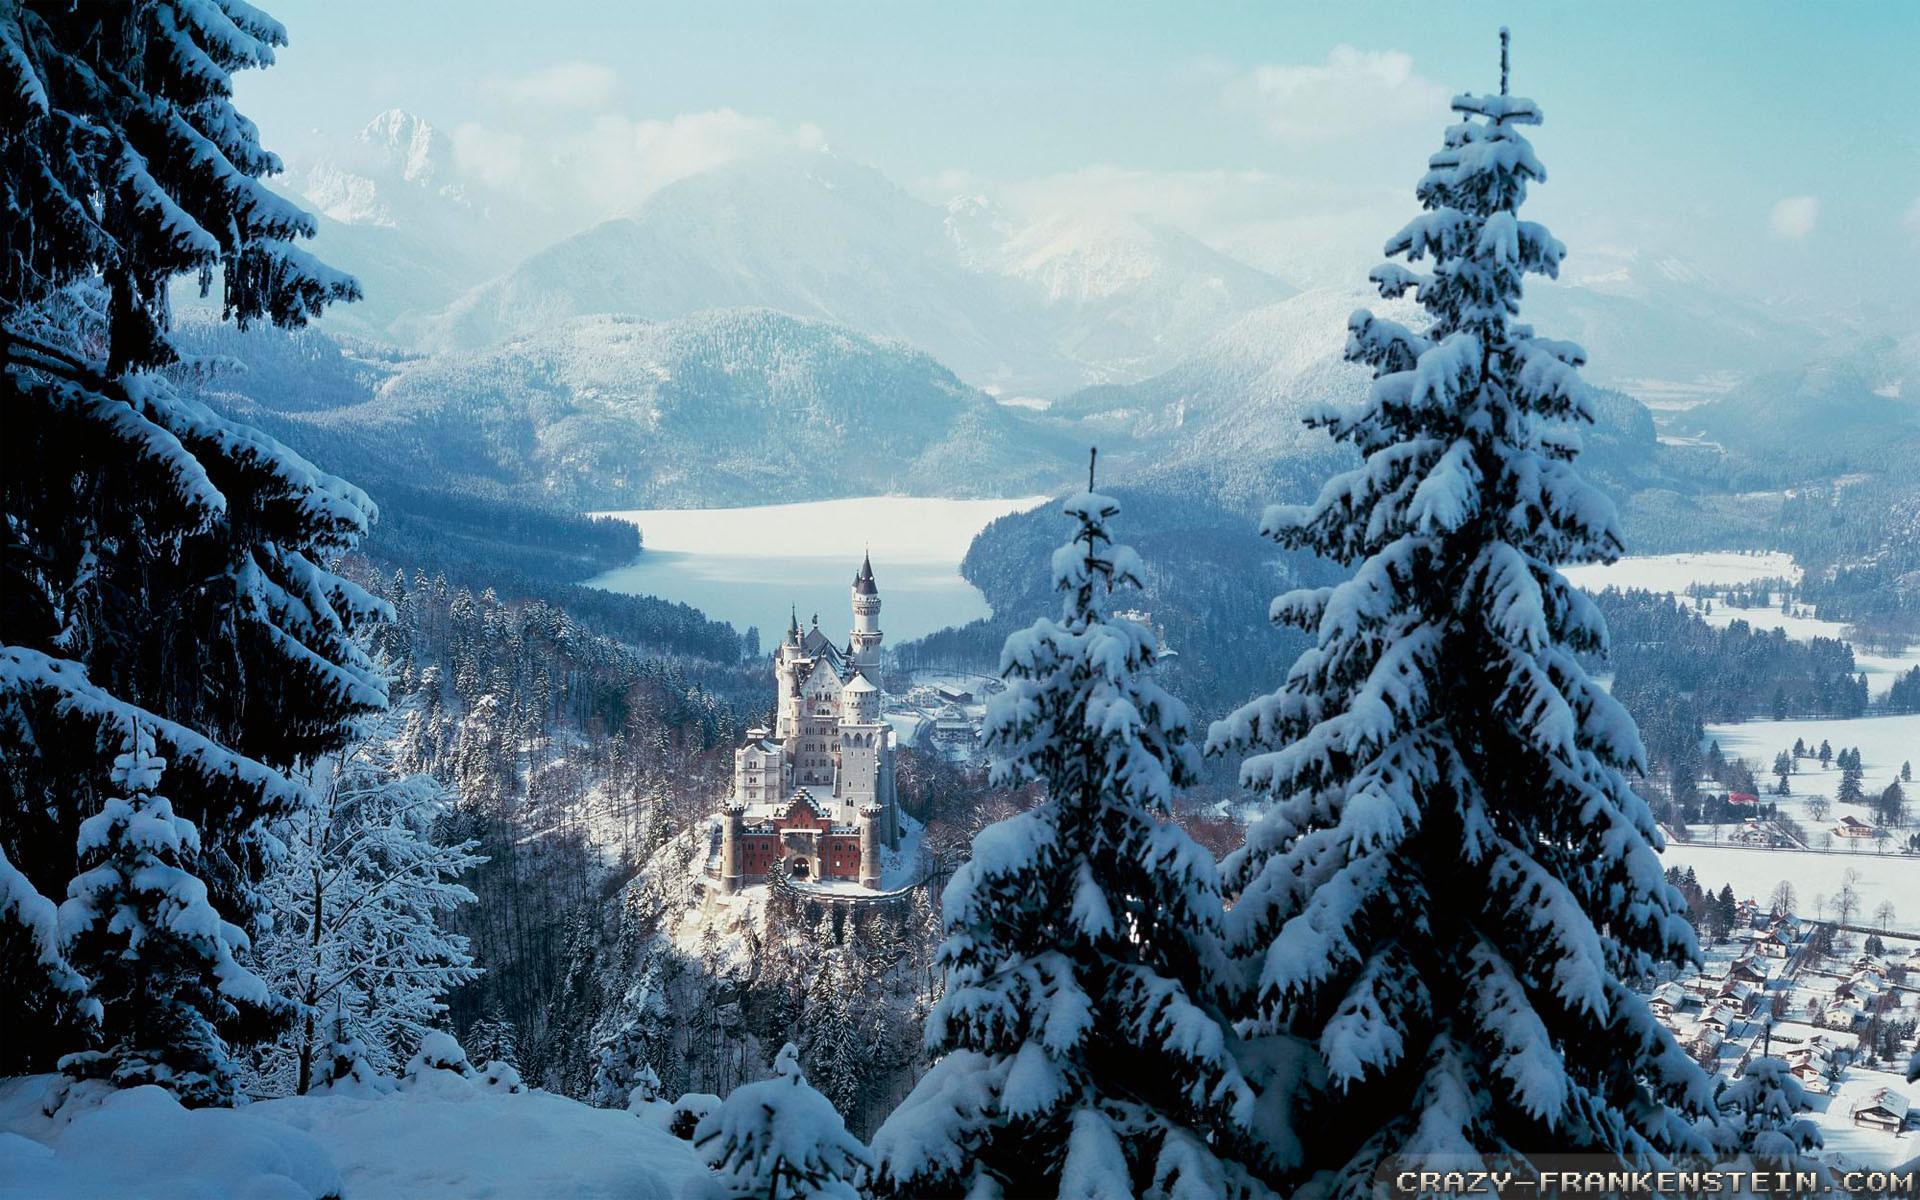 Wallpaper: Winter Mountain wallpapers 7. Resolution: 1024×768   1280×1024    1600×1200. Widescreen Res: 1440×900   1680×1050   1920×1200